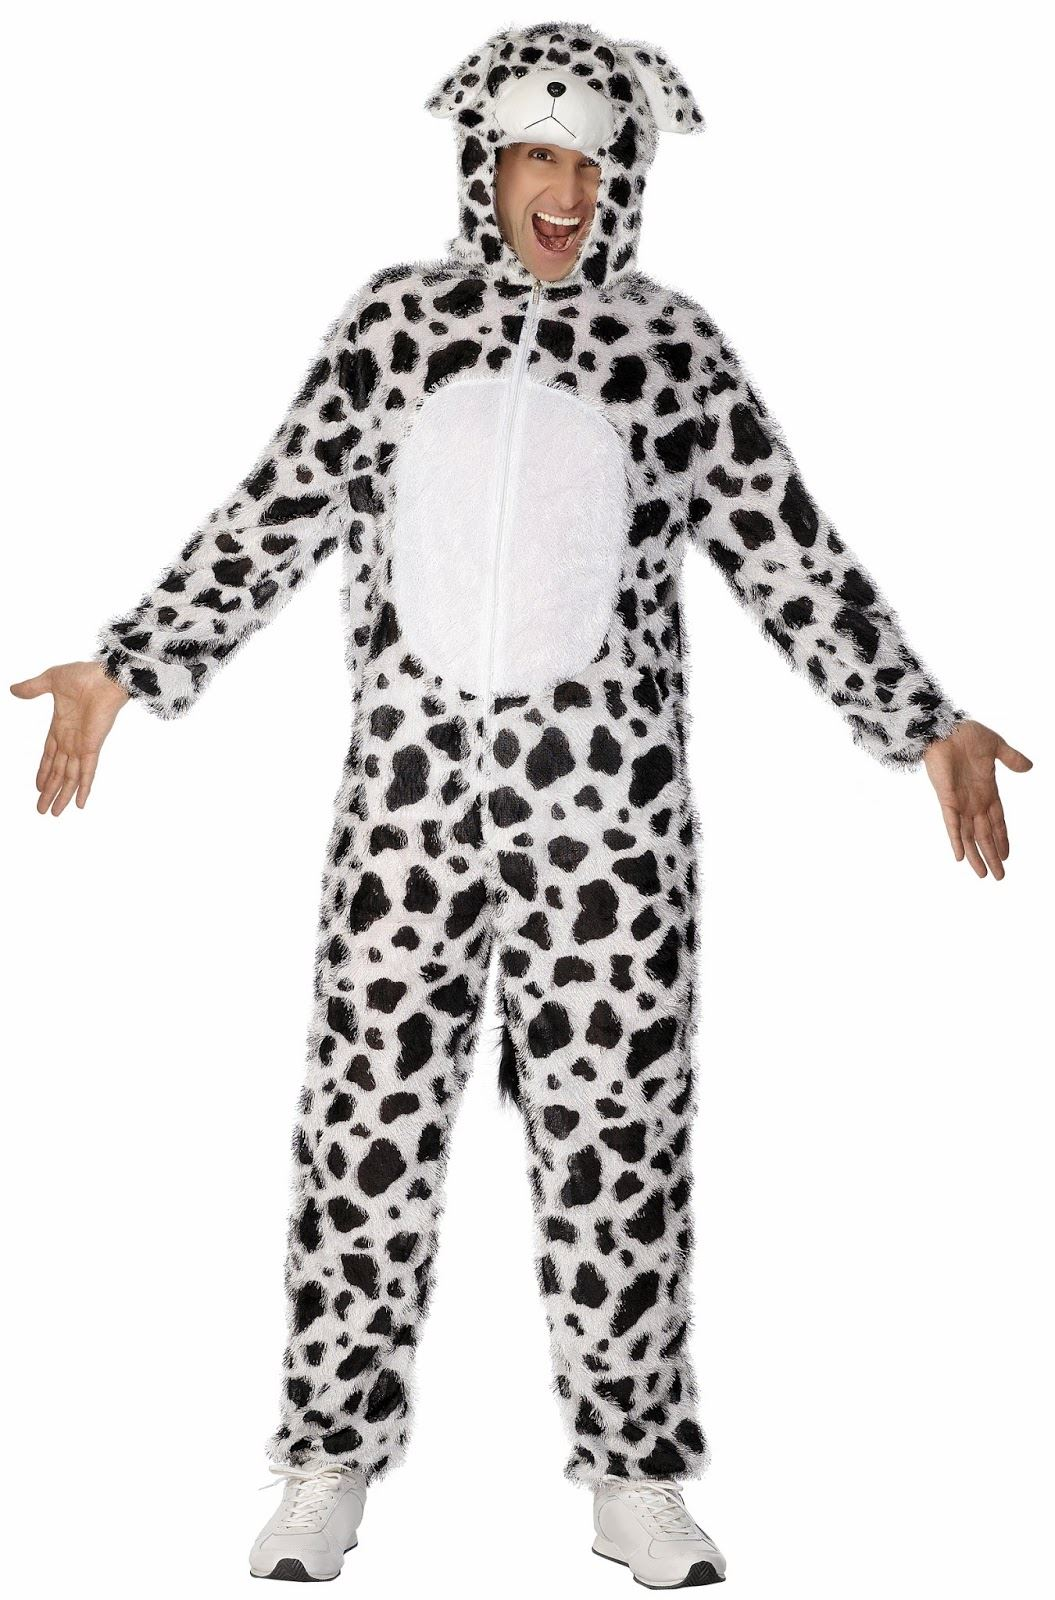 Adult Wild Animals Fancy Dress Party Animal Romber suit | eBay